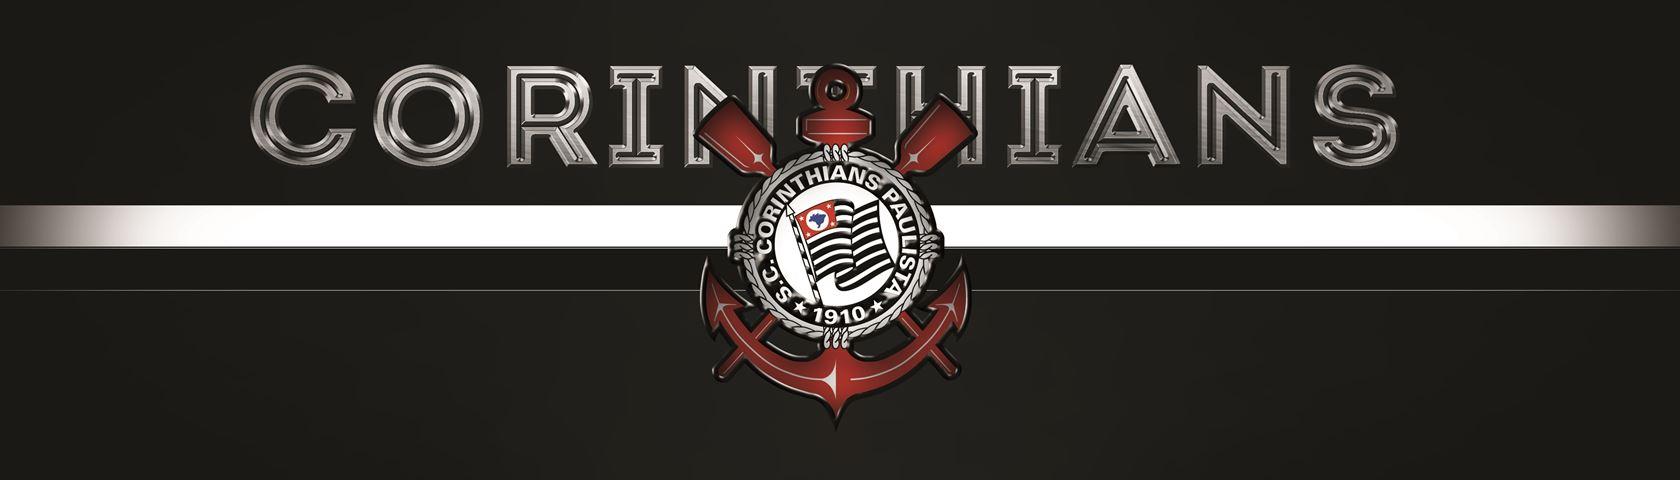 S.C.Corinthians Paulista